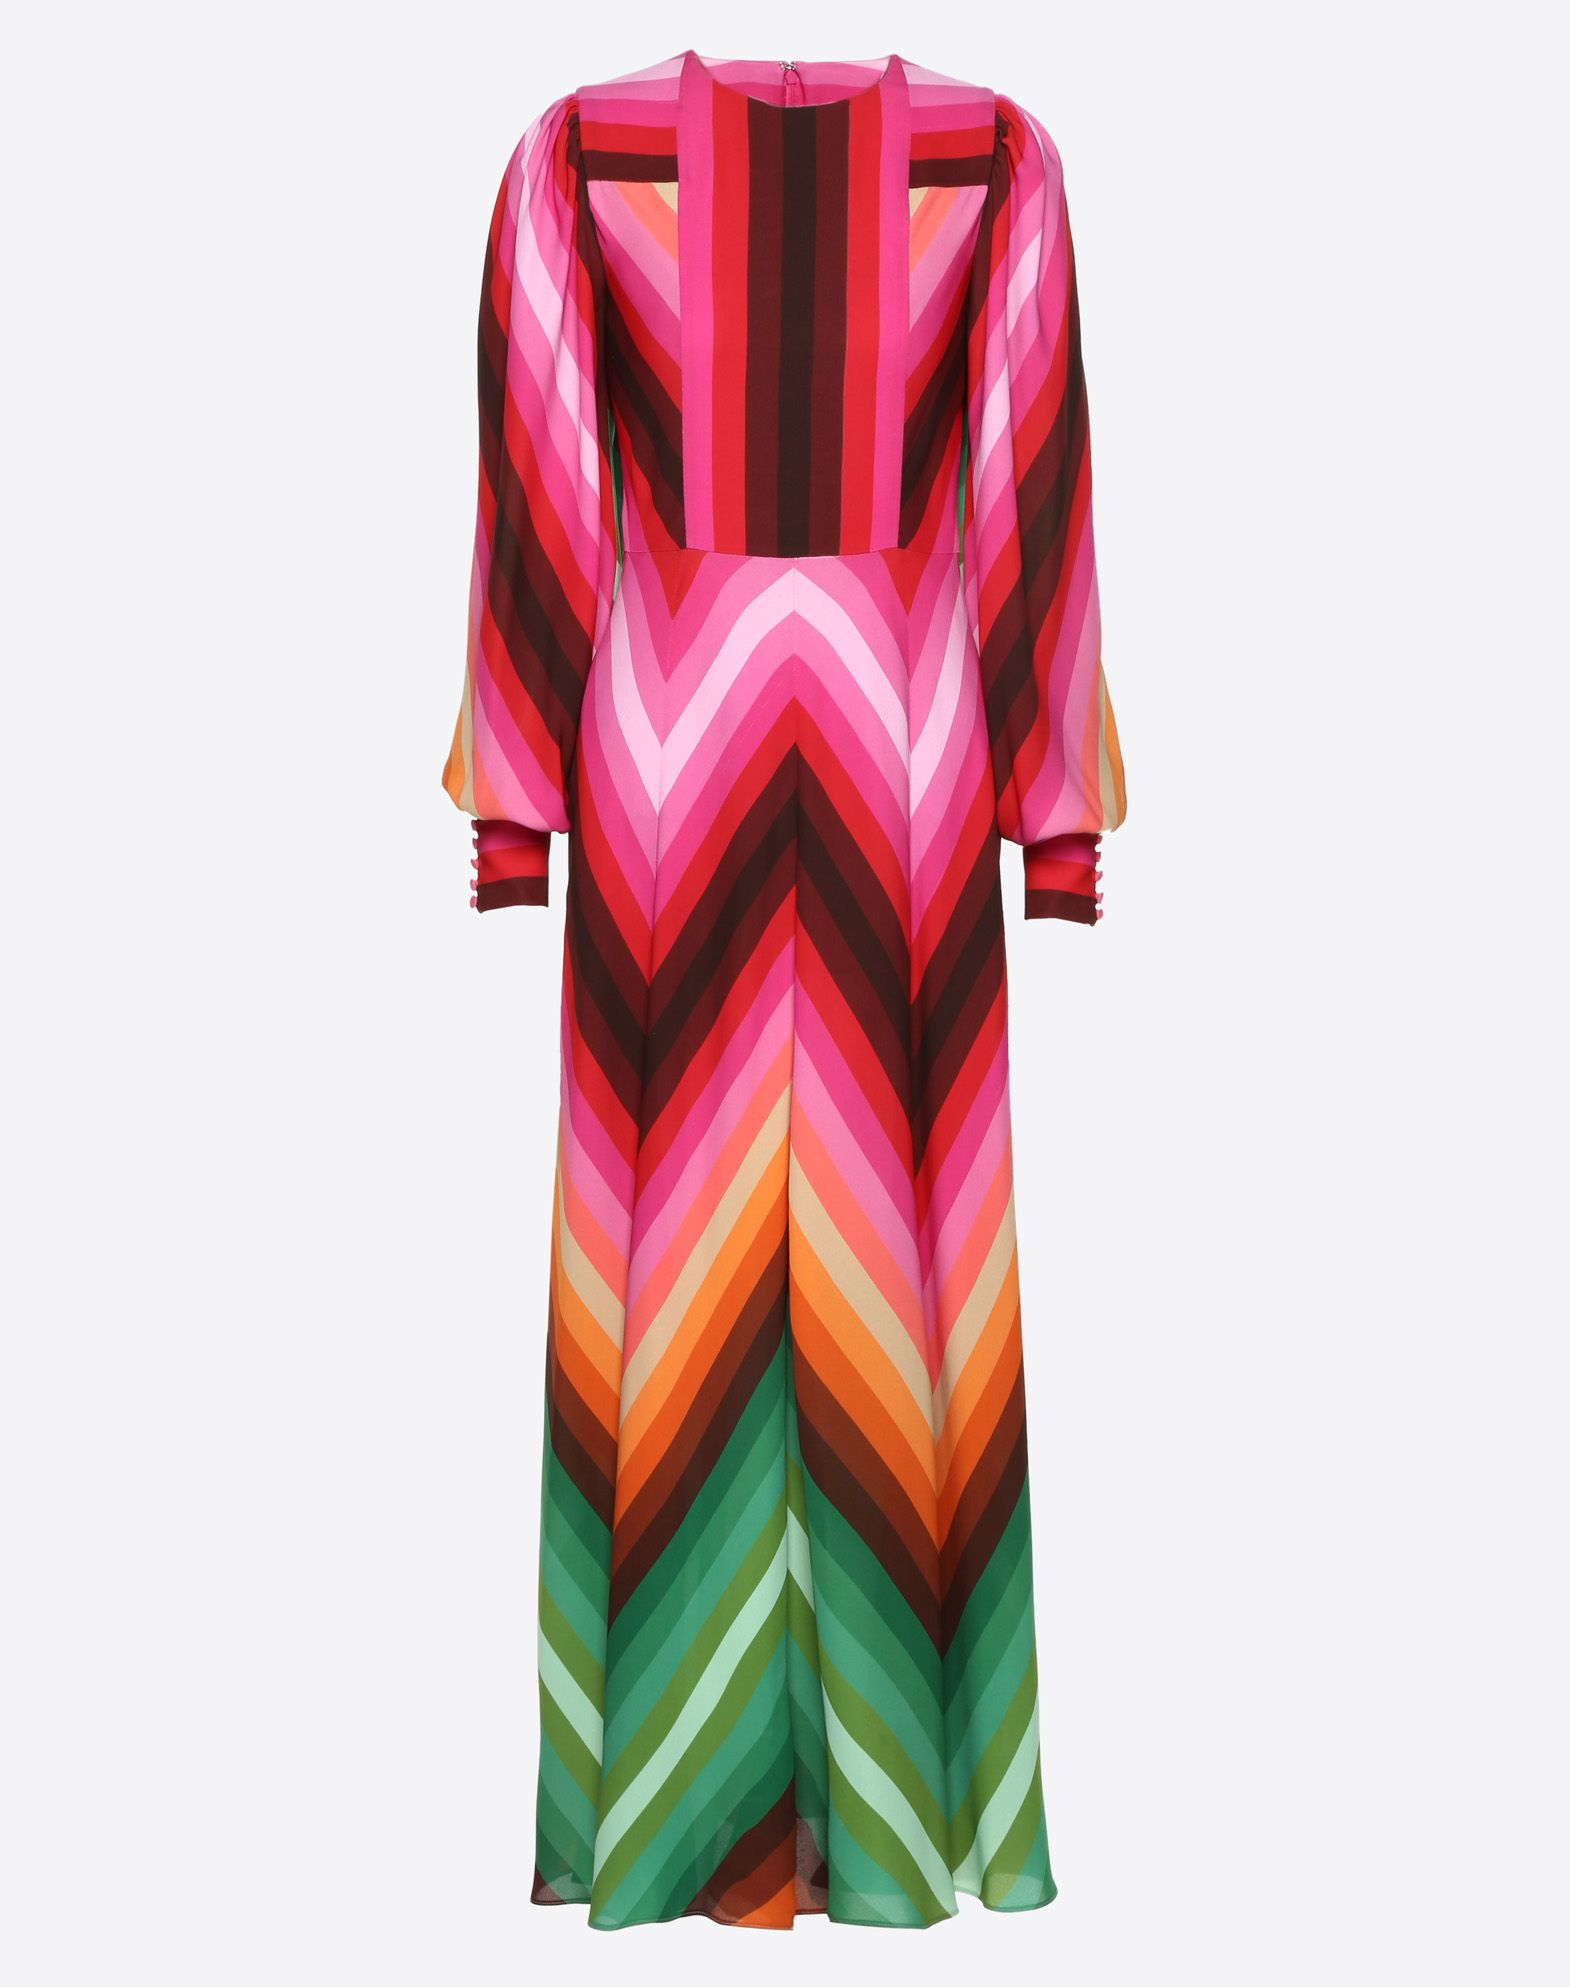 Bayadère Crepe de Chine Dress